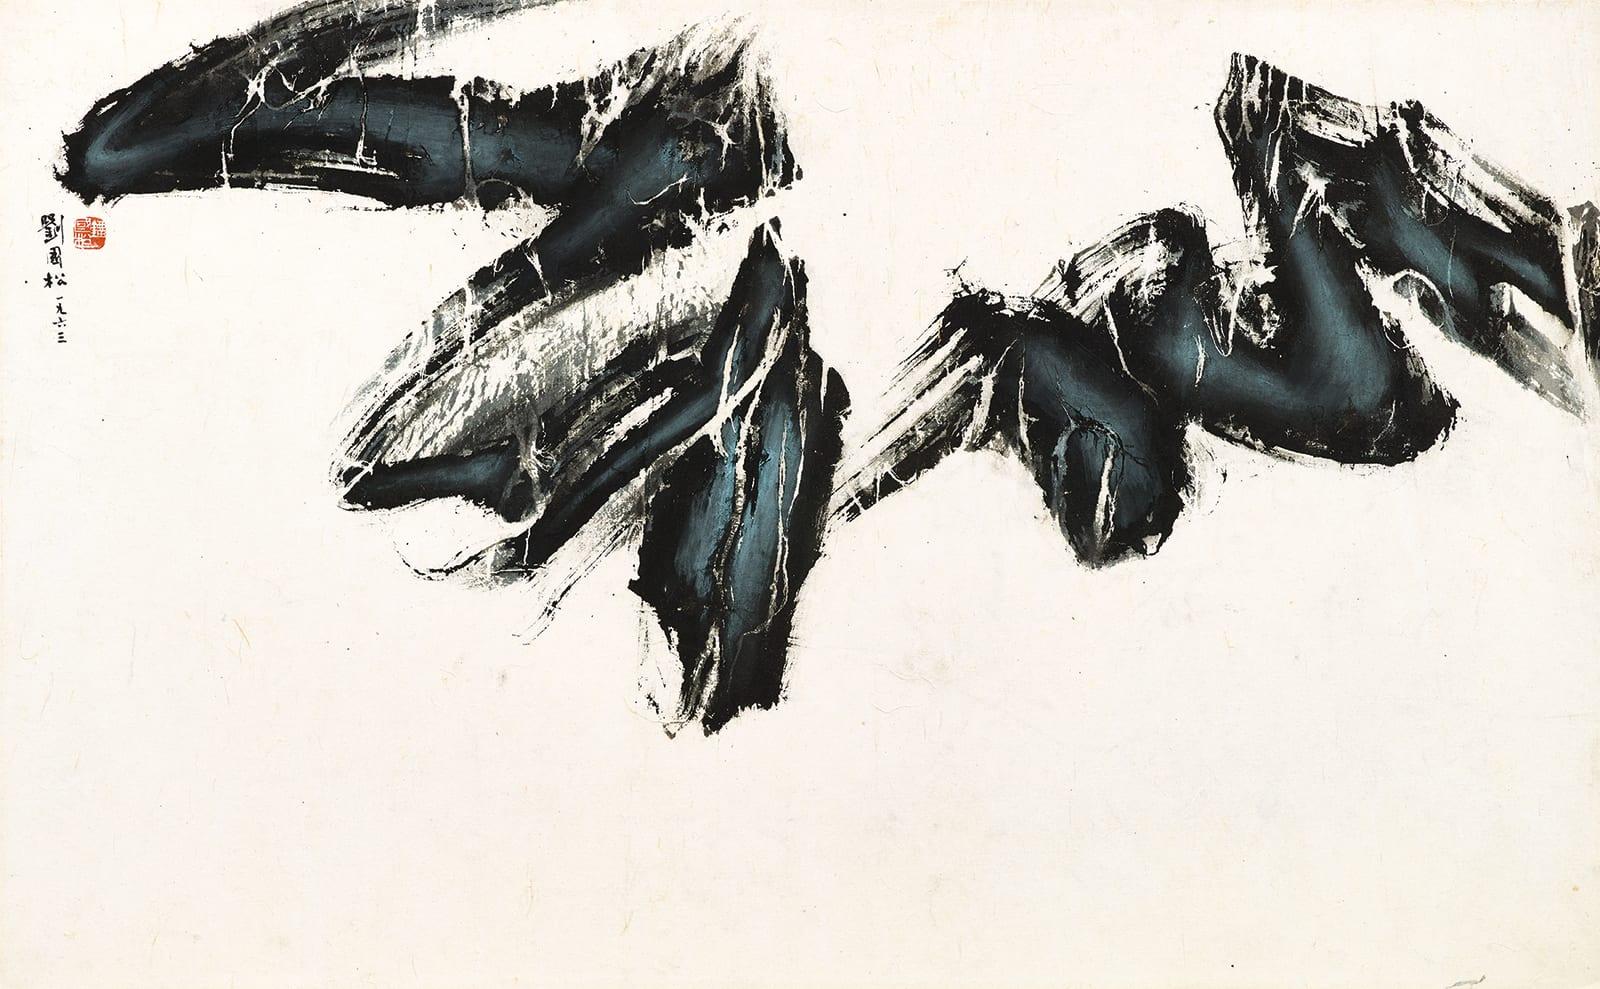 Liu Kuo-Sung 劉國松, Landscape 山水, 1963